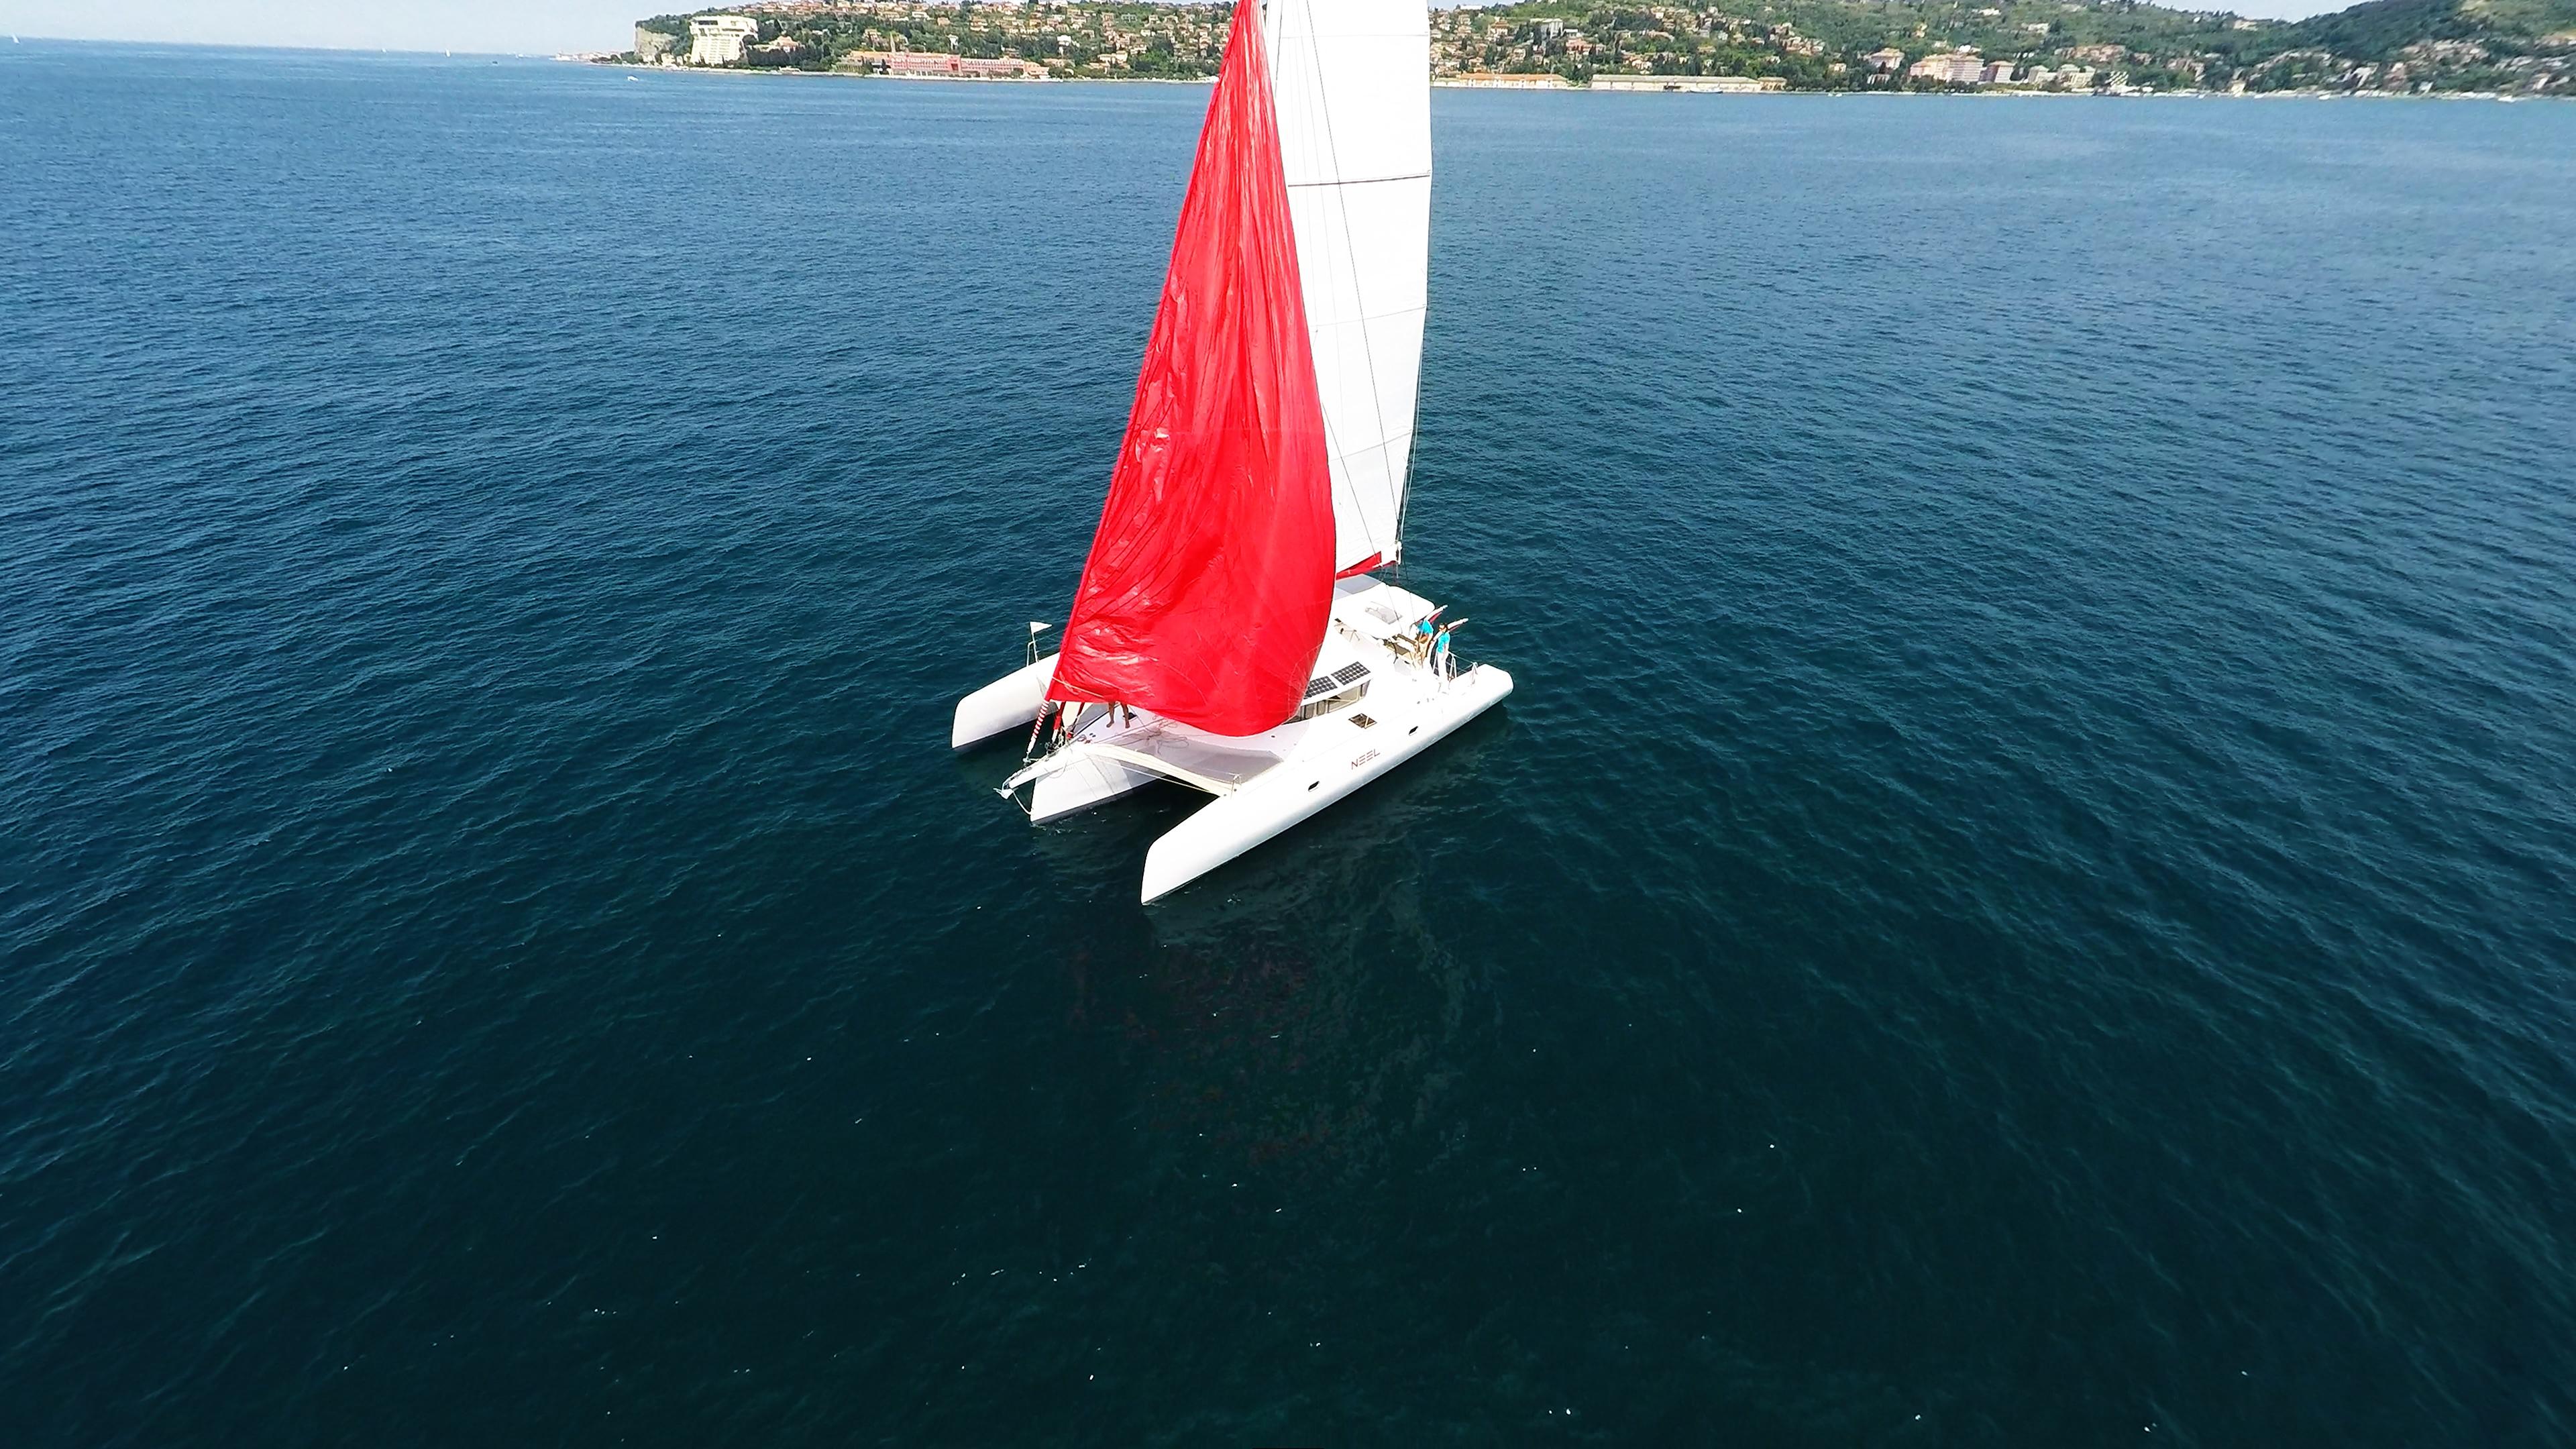 trimarano foto aerea hoisting rosso gennaker vela yacht